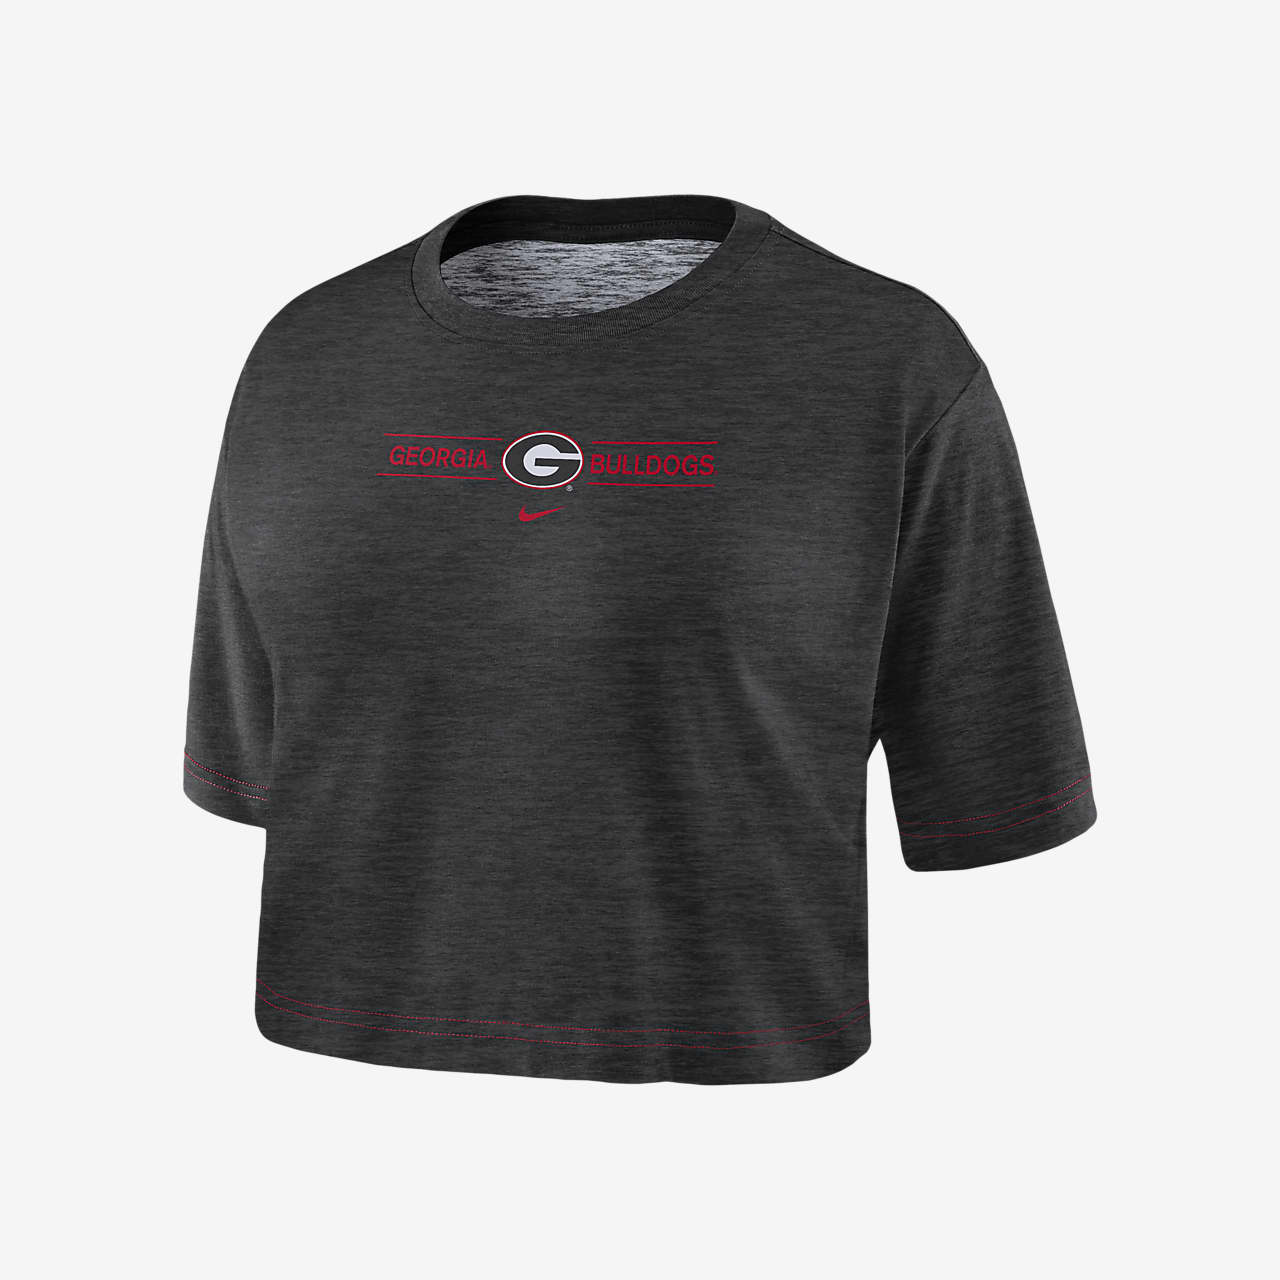 Nike College Dri-FIT (Georgia) Women's Cropped T-Shirt